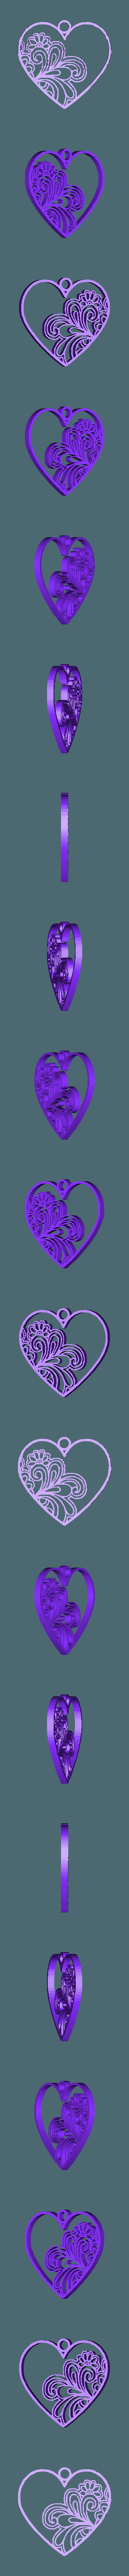 Coeur mural.stl Download free STL file HEART • 3D printing template, oasisk